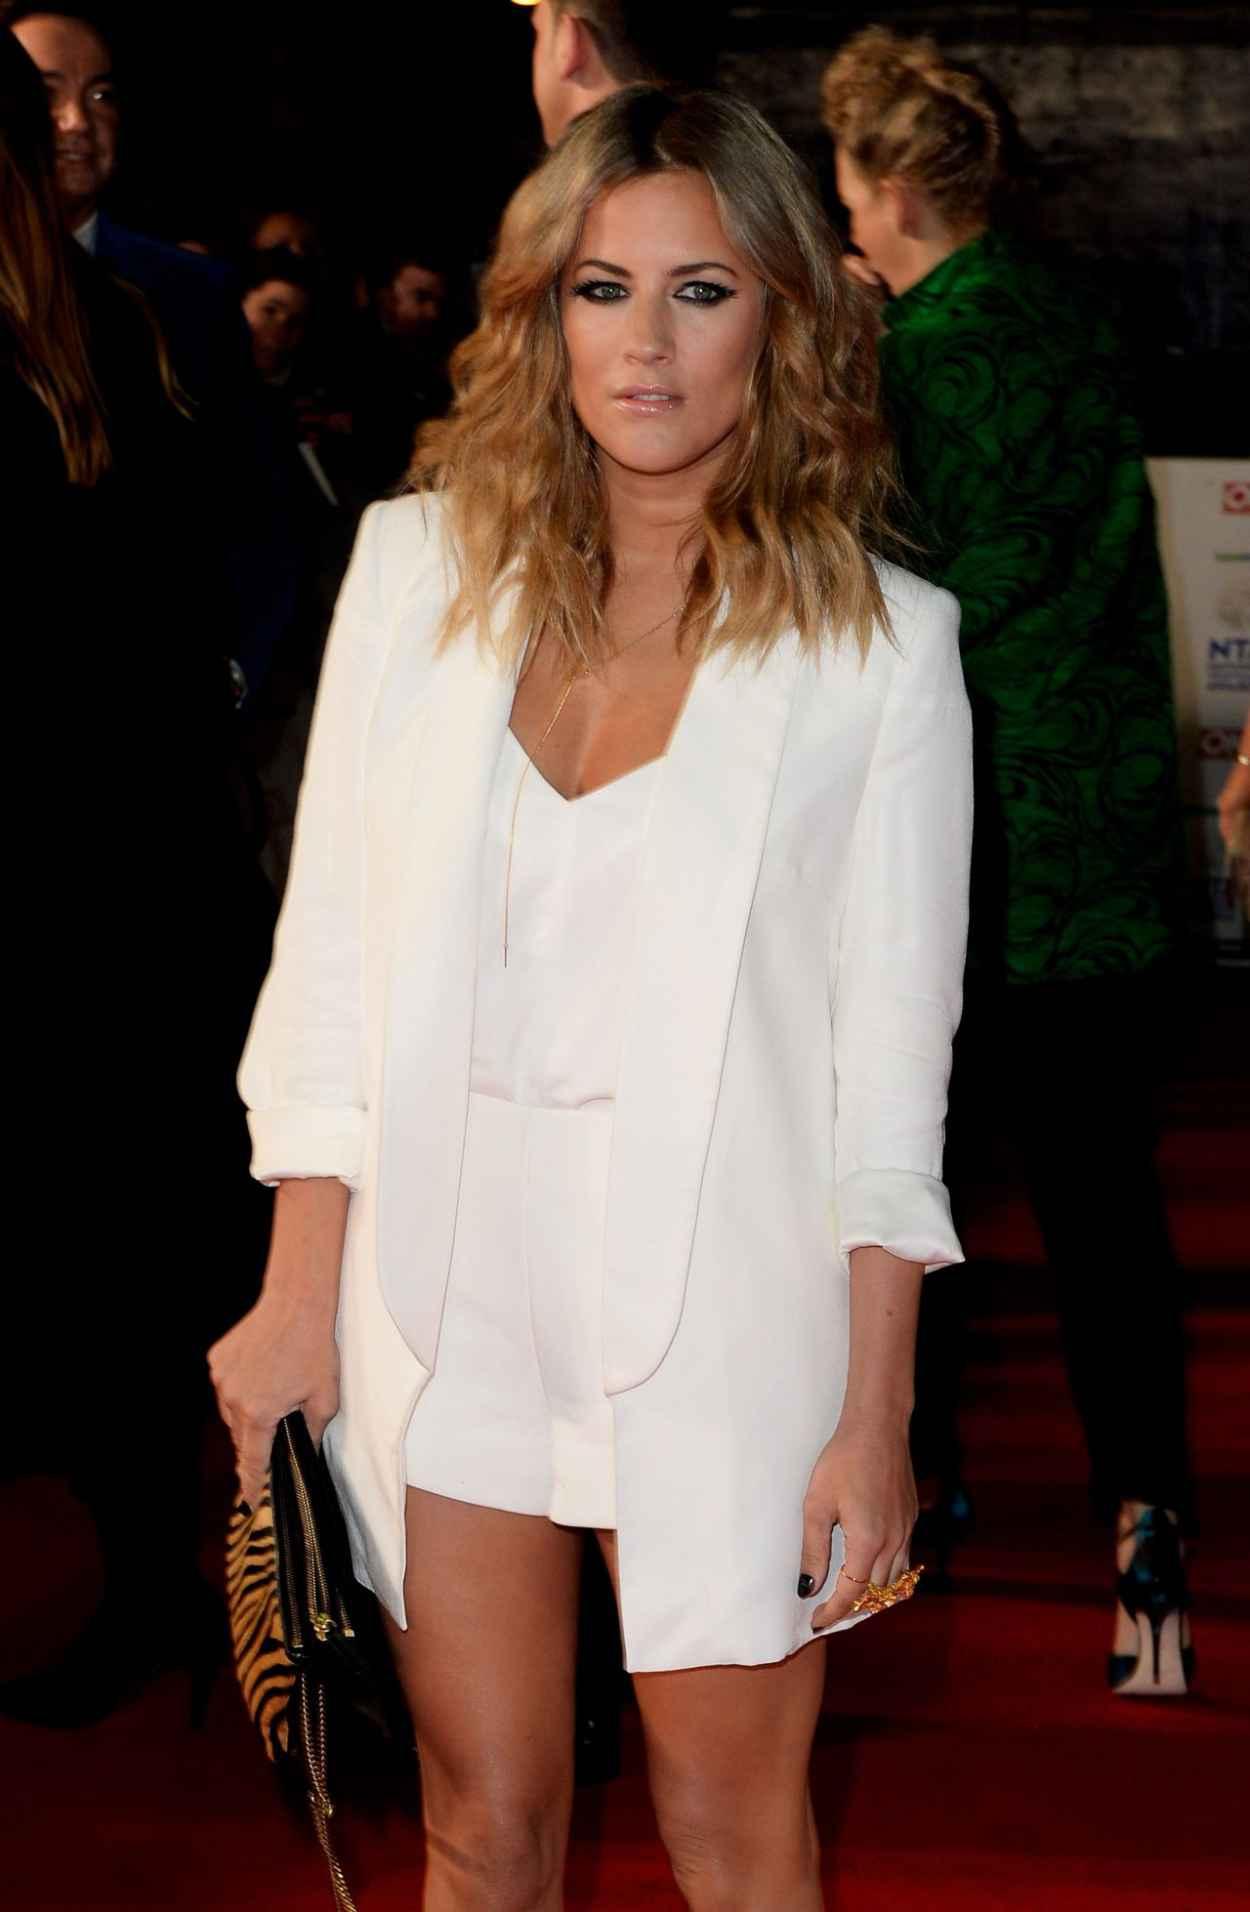 Caroline Flack - National Television Awards in London, January 2015-1